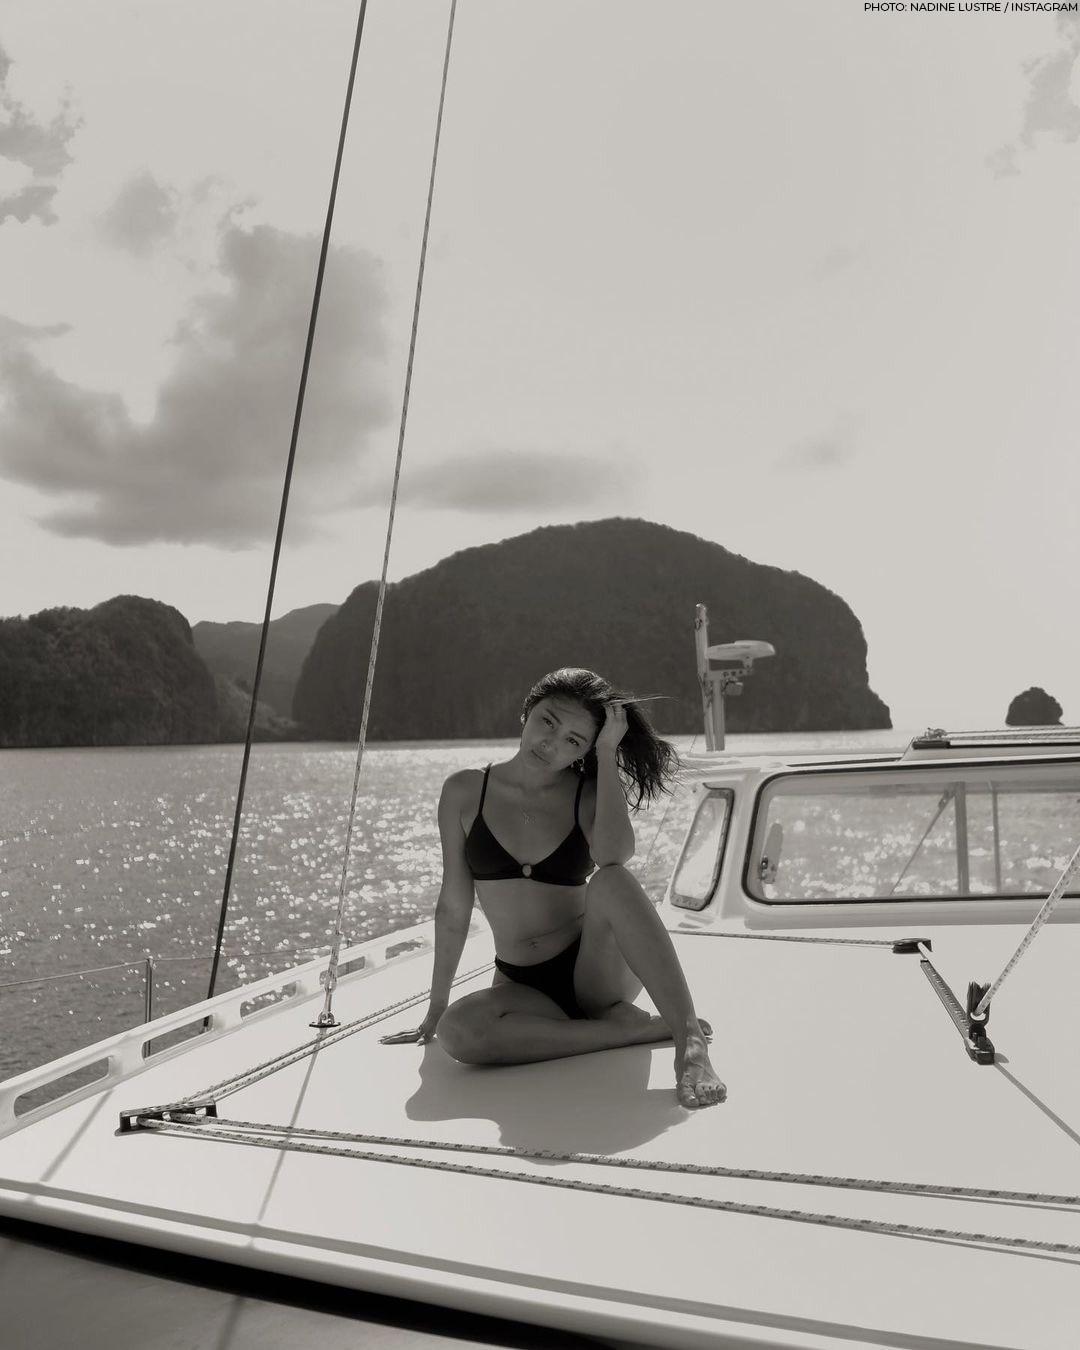 Best of Nadine Lustre's bikini photos